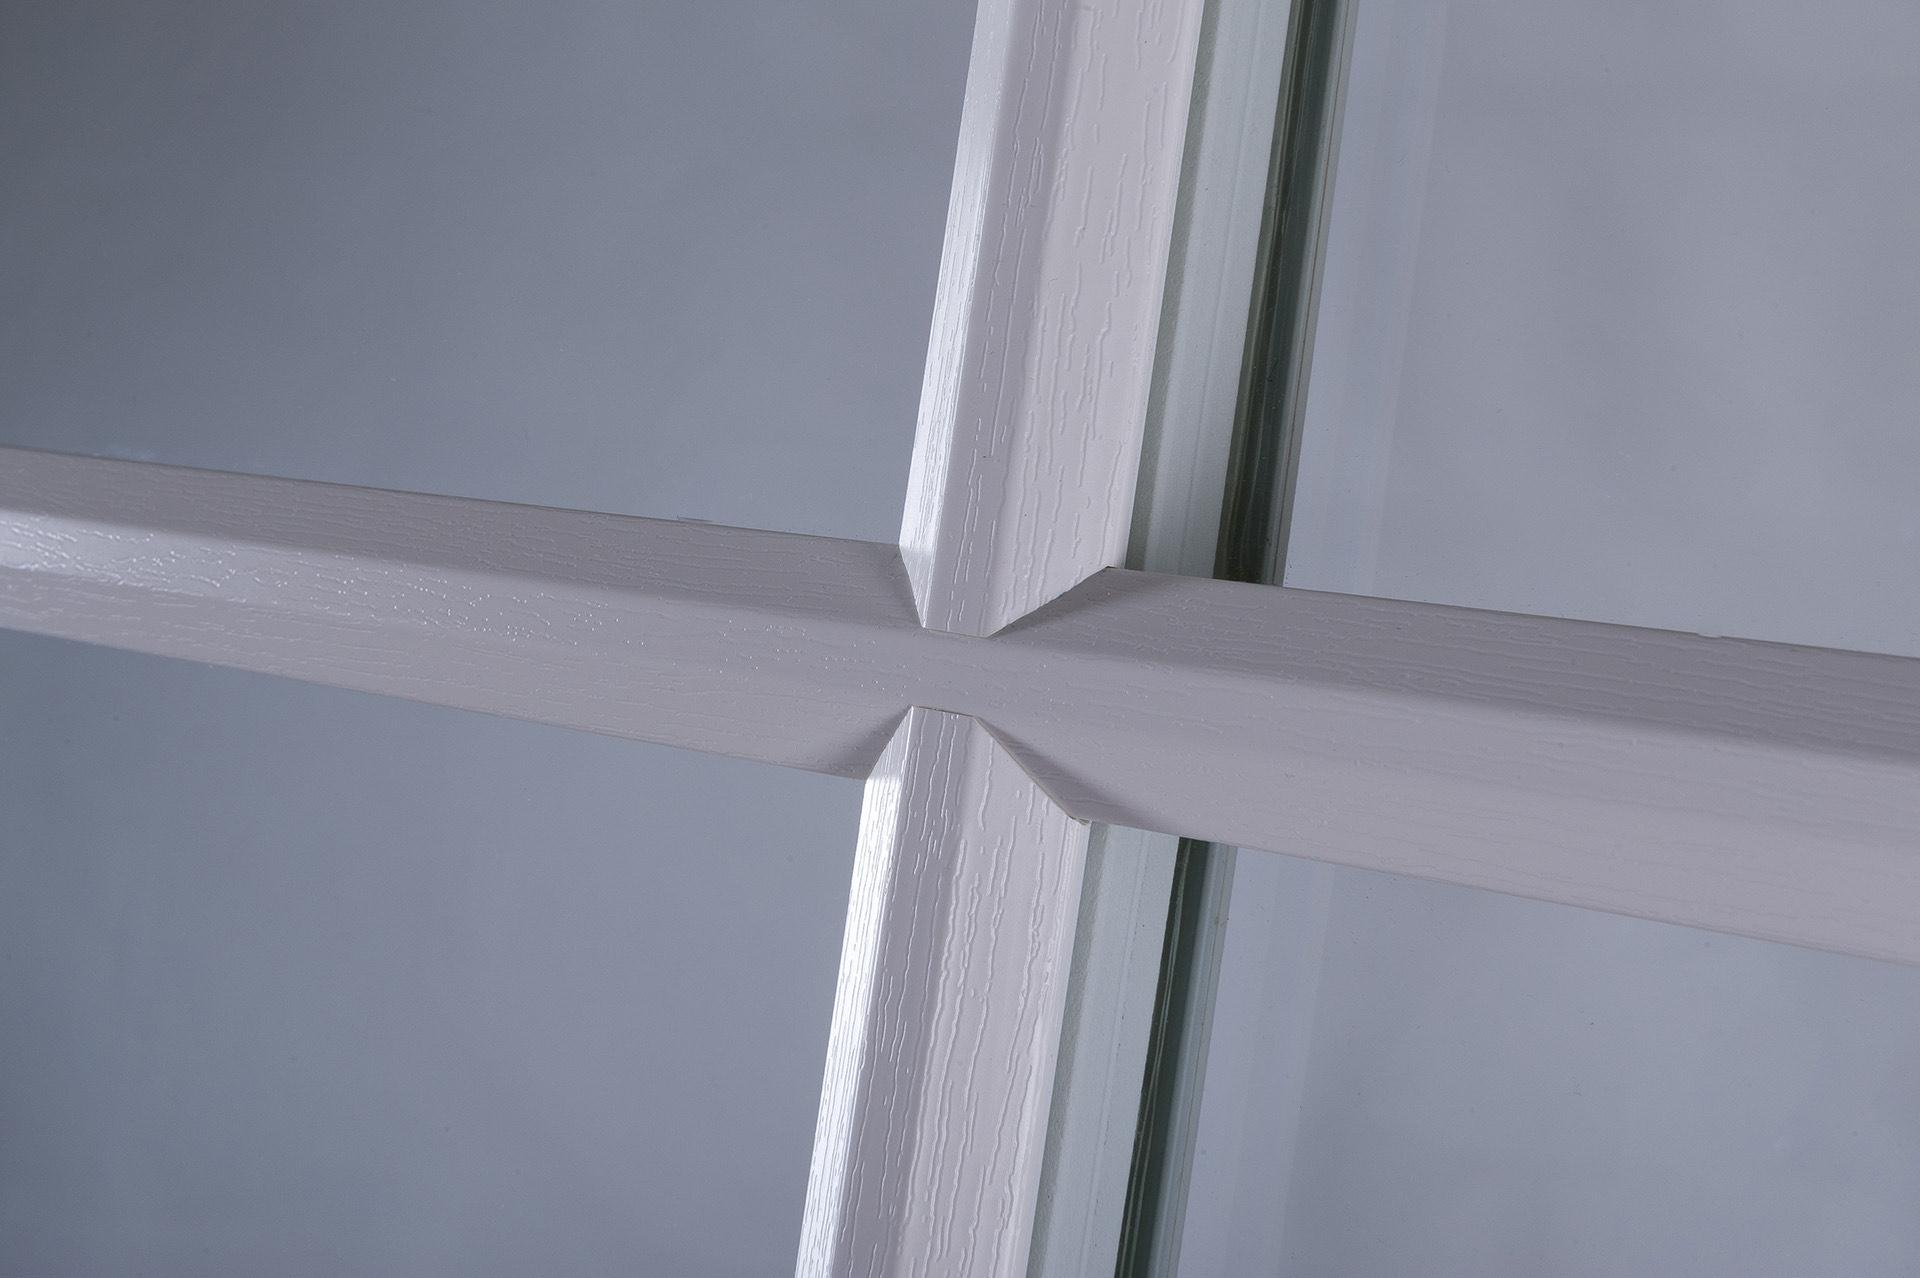 Sash Windows Astragal Bars